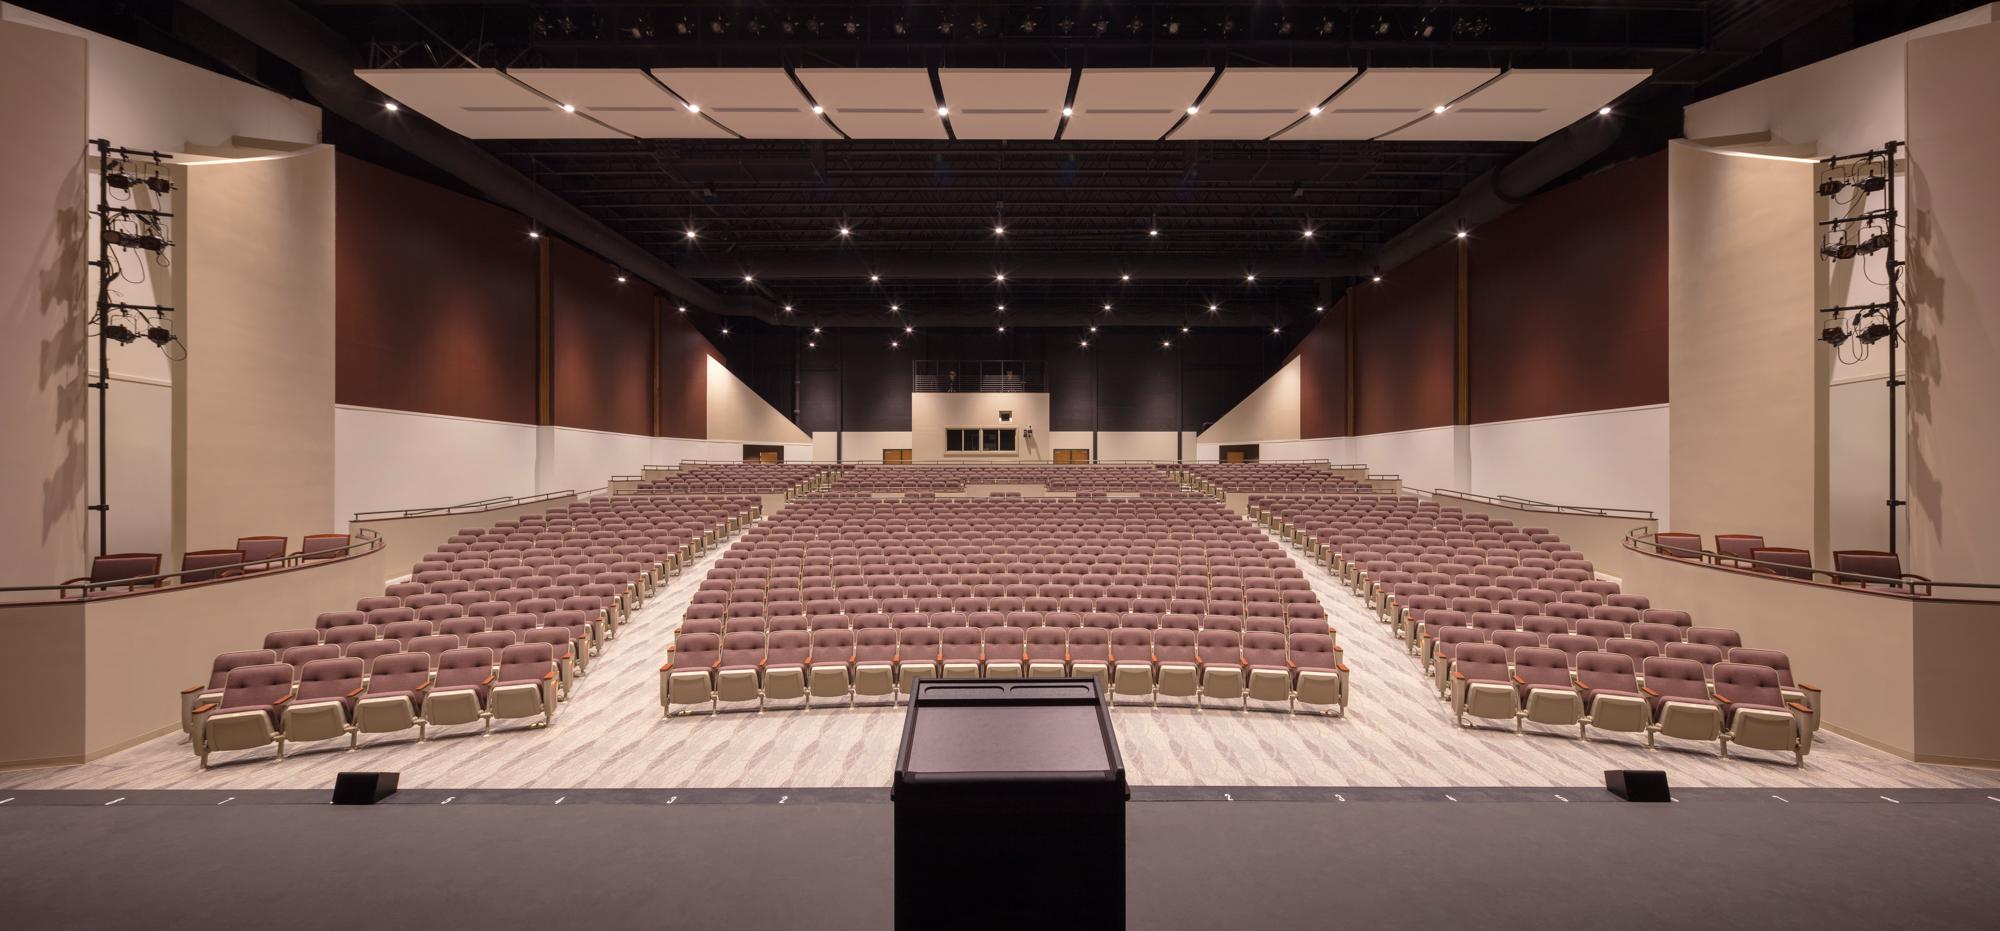 Newtown High School Auditorium seats